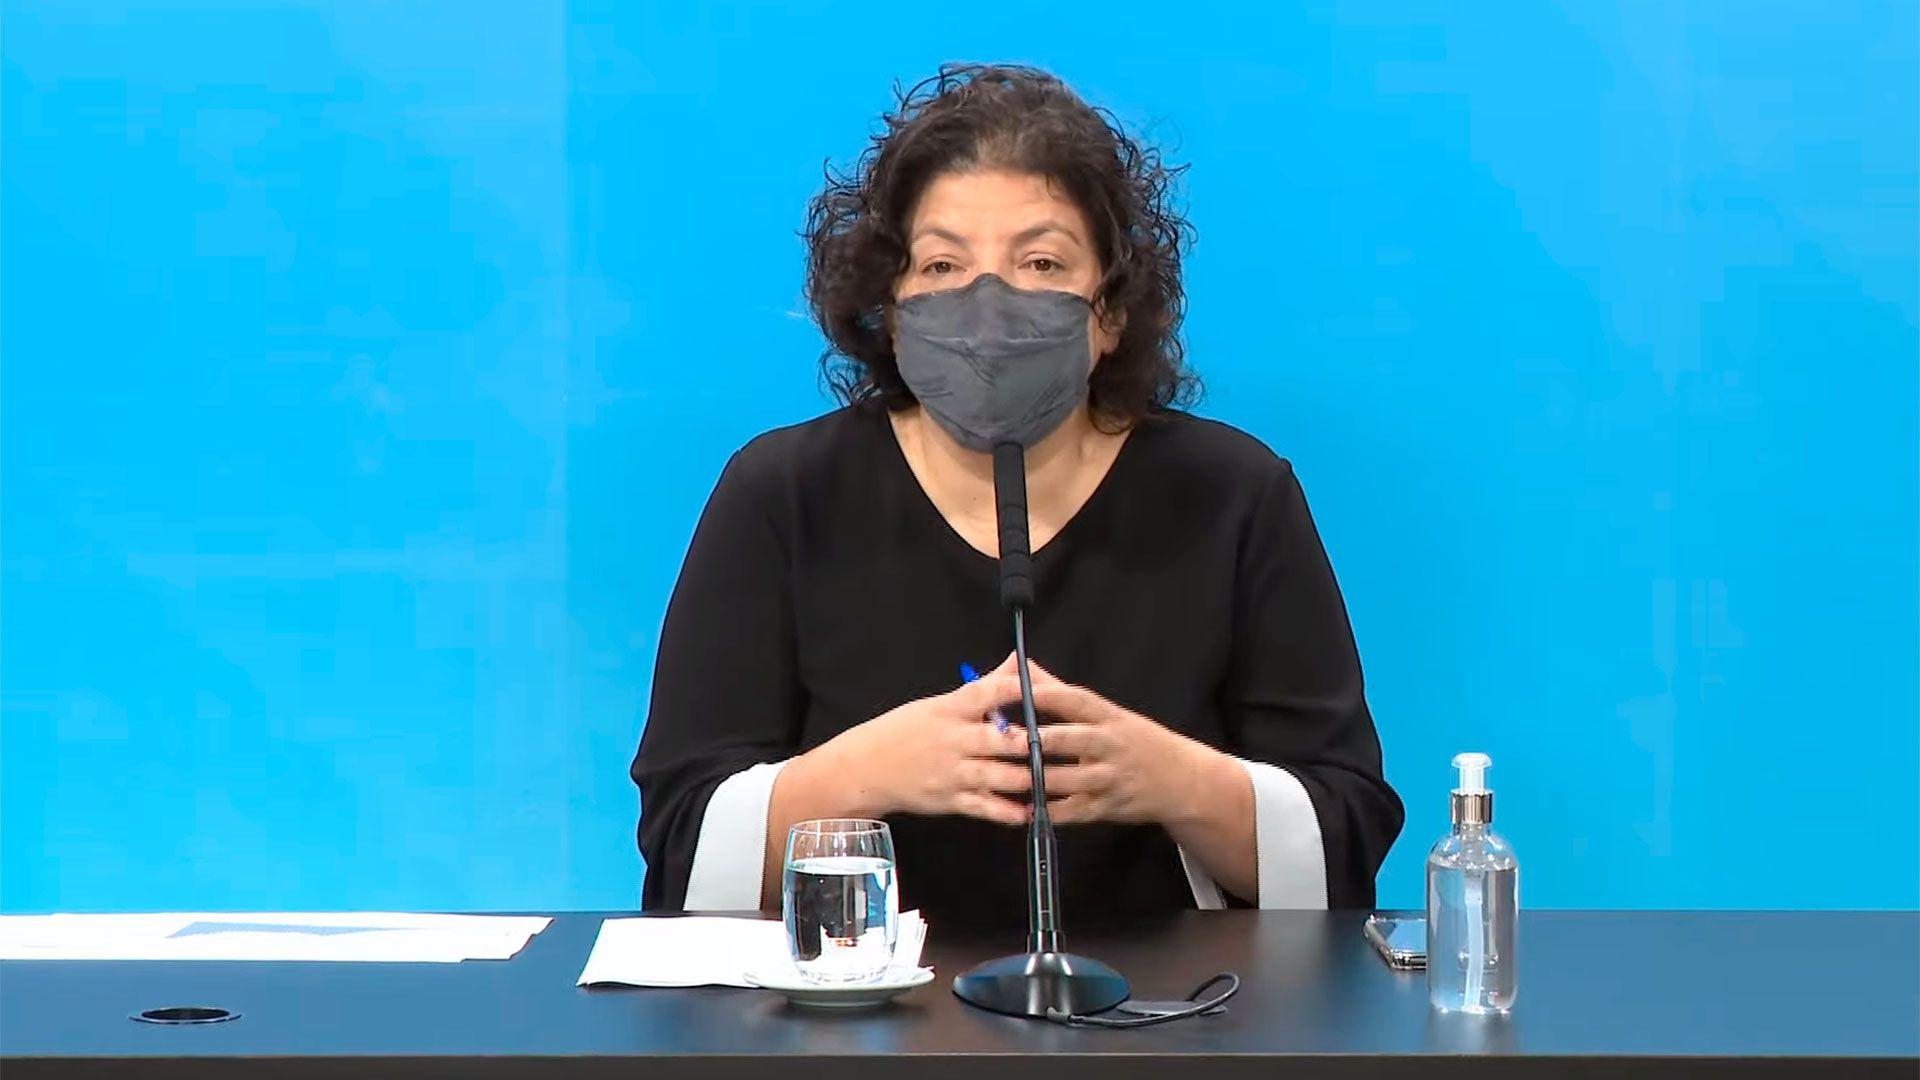 Conferencia de prensa de la ministra de Salud, Carla Vizzotti